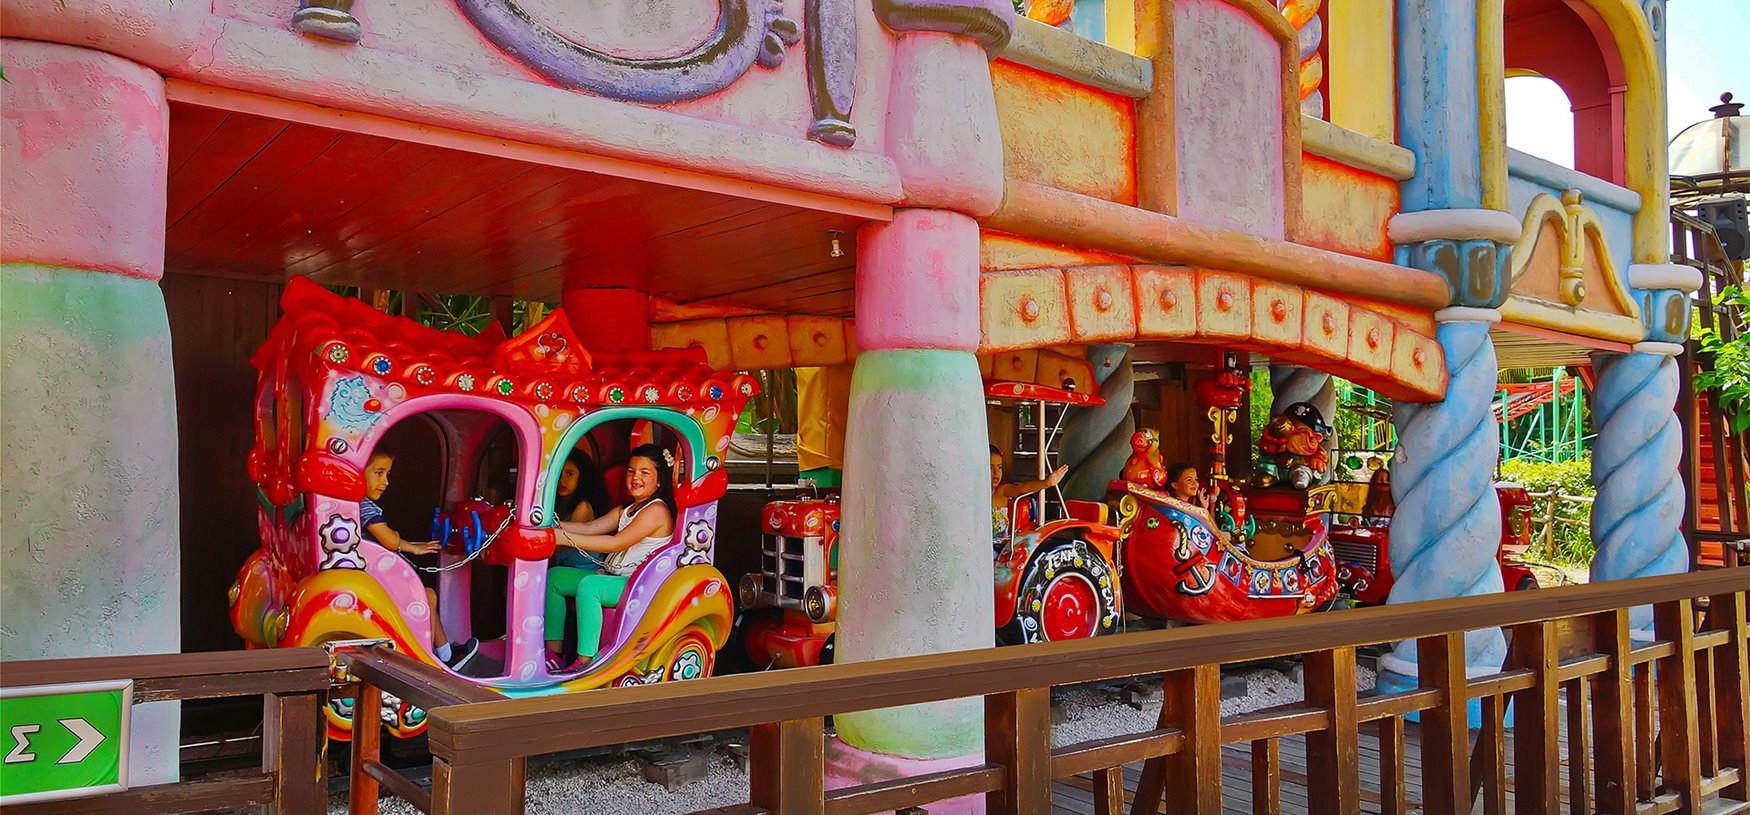 caab2d64b2a Allou Fun Park   1+1 Δώρο   COSMOTE DEALS for YOU   2 Εισιτήρια στην ...